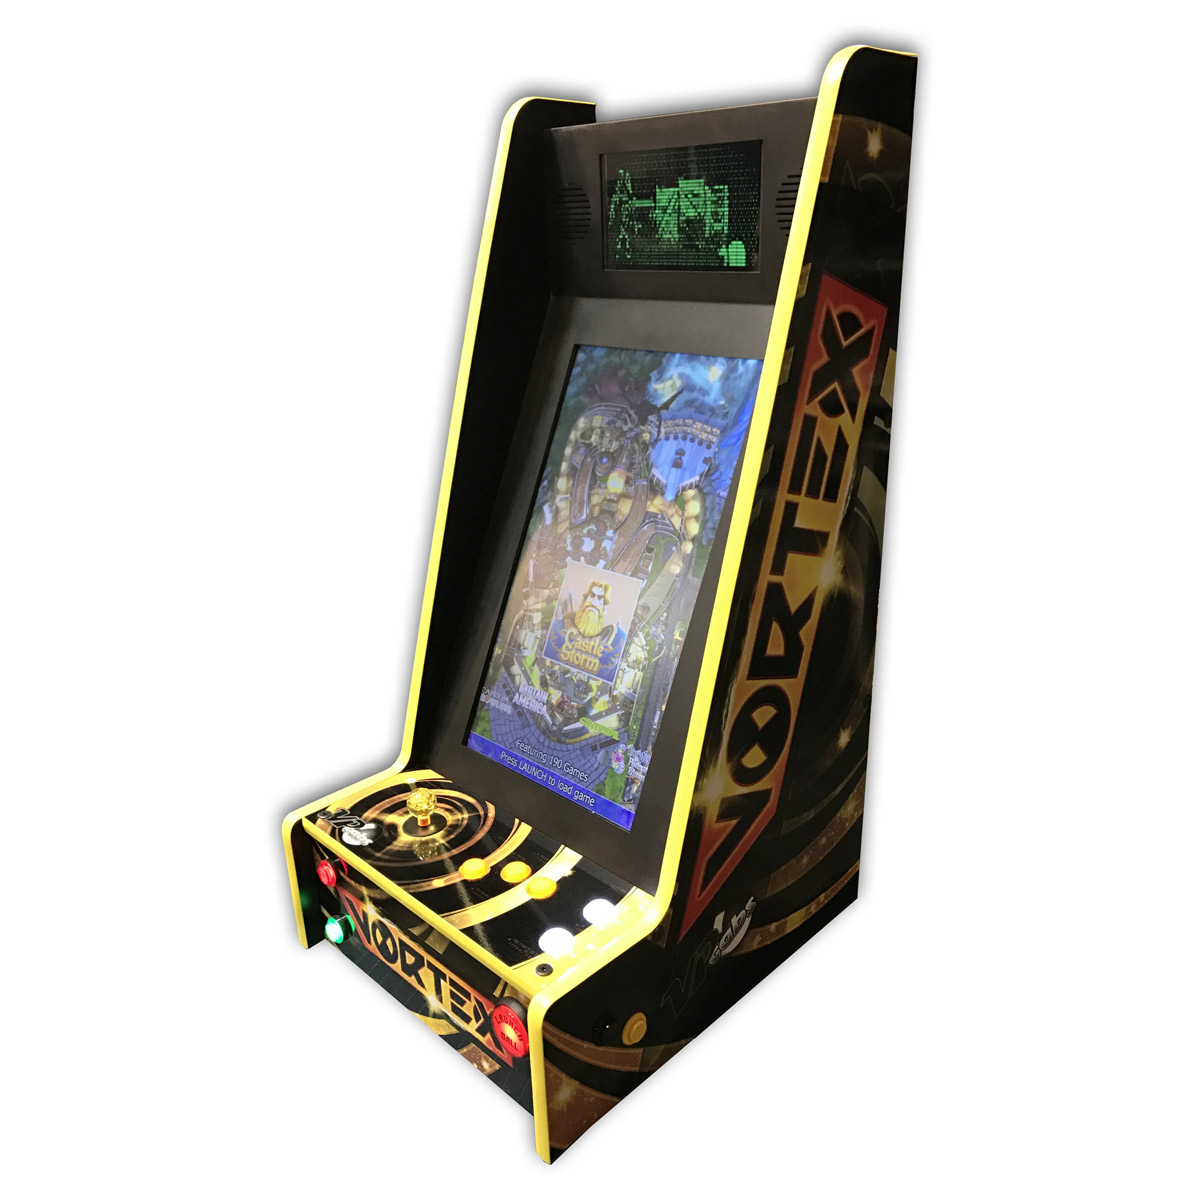 VPCabs Vortex - Virtual Pinball Arcade With 70 Games